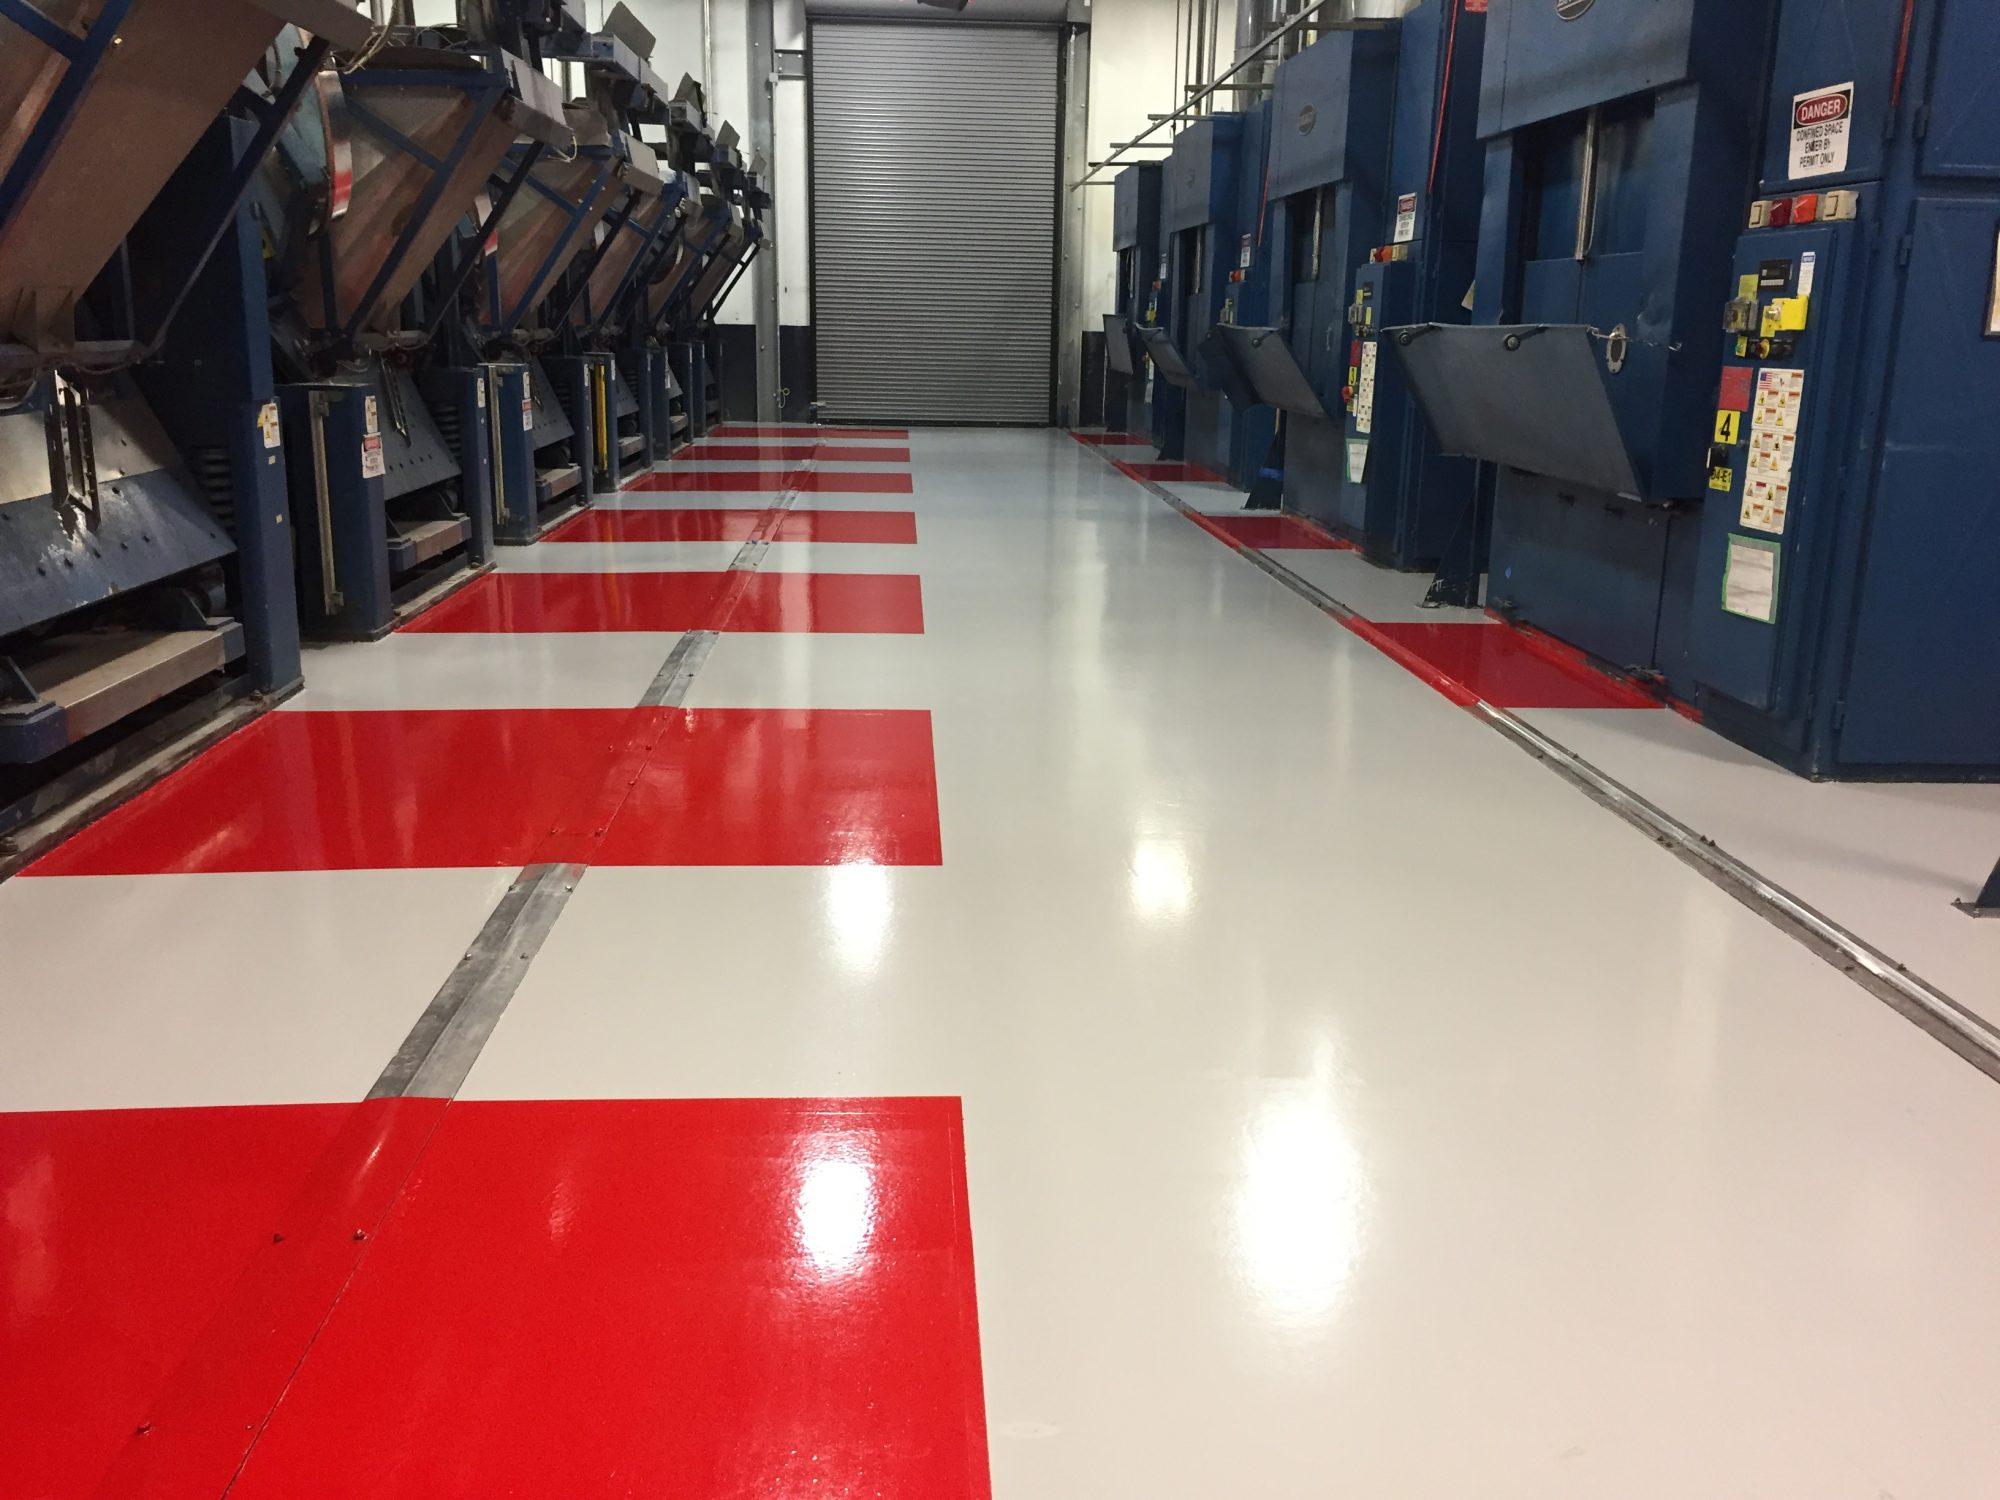 5S safety markings, epoxy floor coatings, safety floor markings